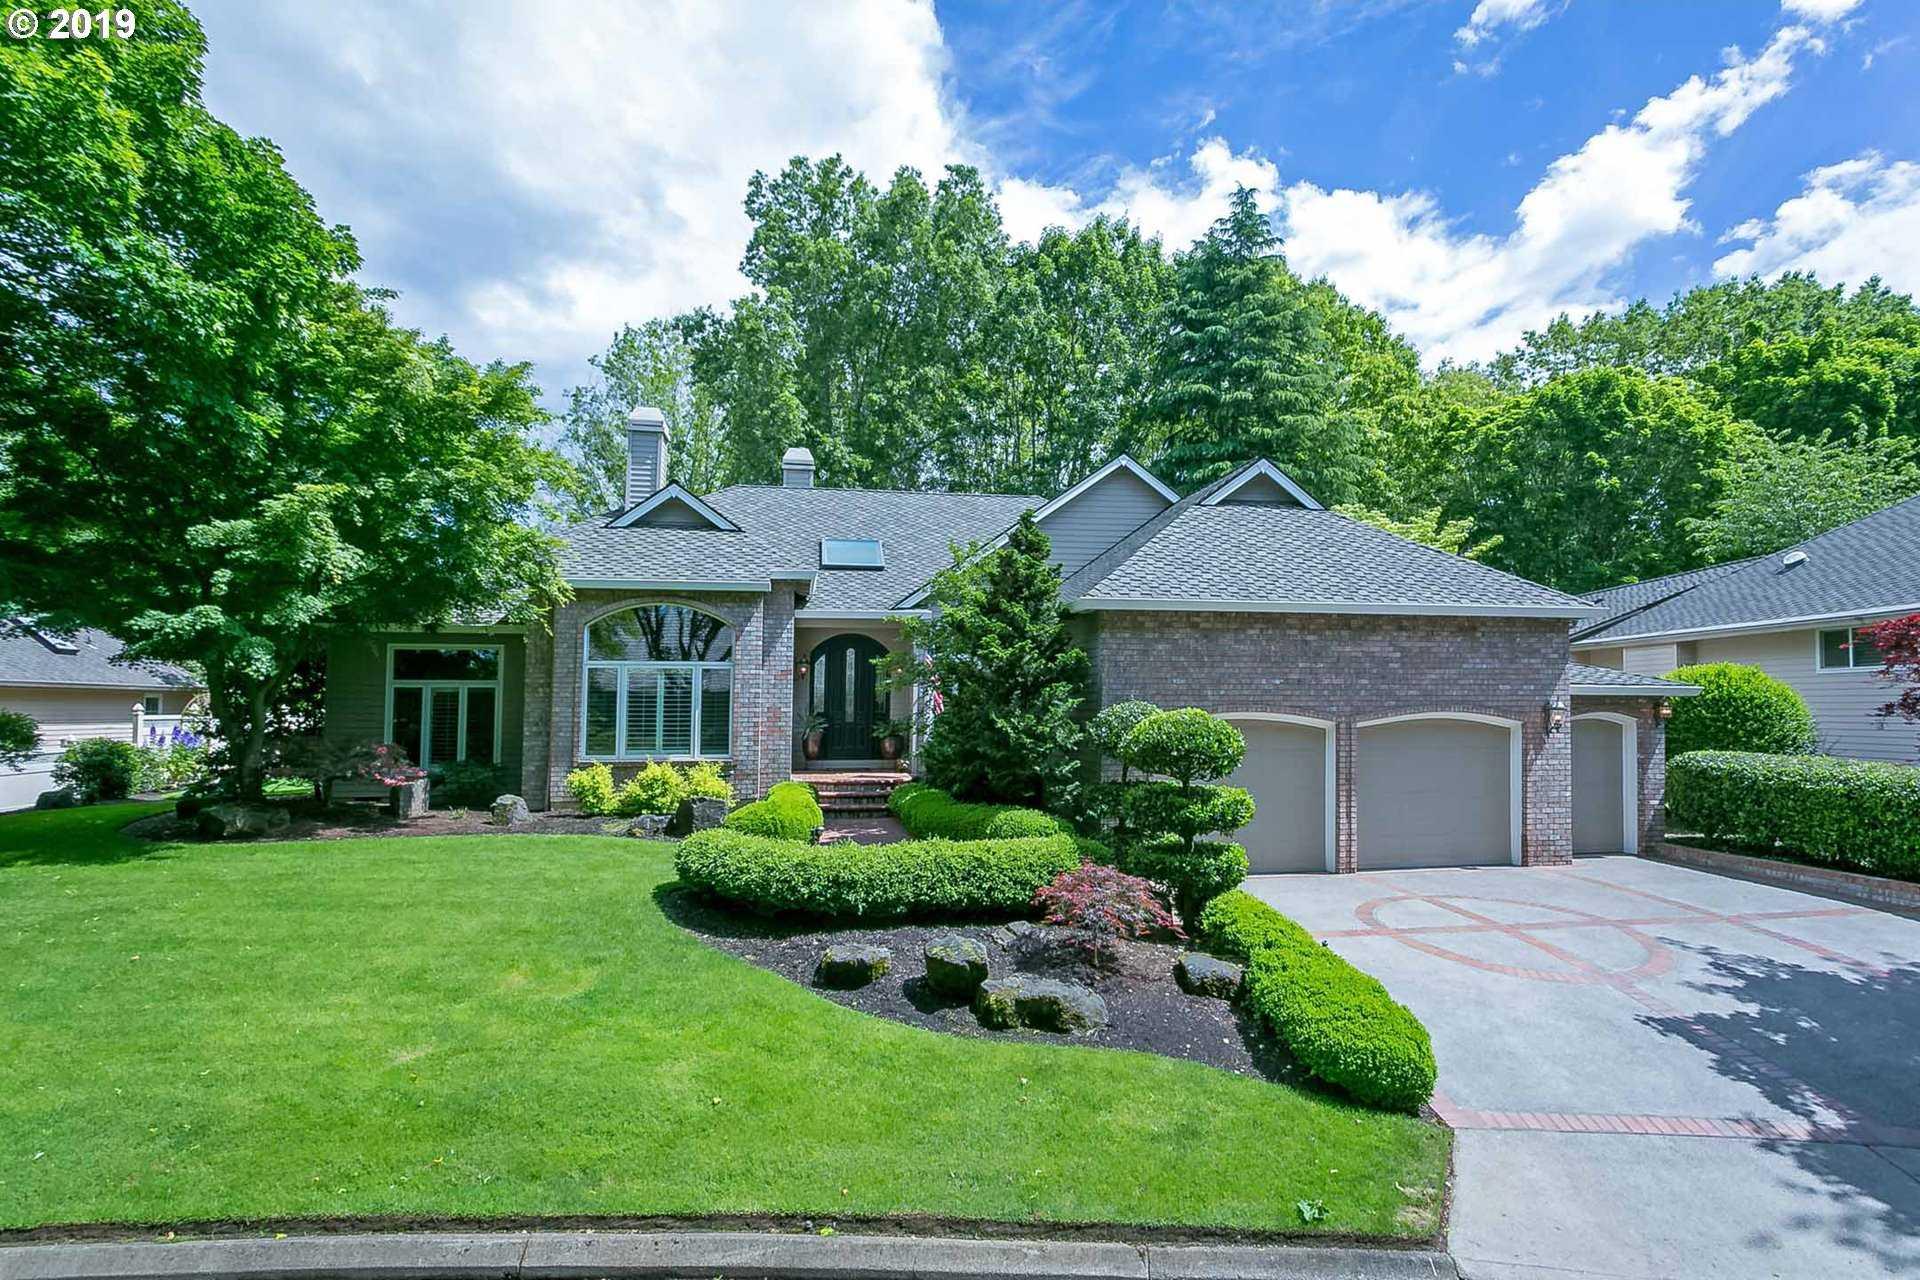 $900,000 - 3Br/2Ba -  for Sale in Charbonneau Edgewater, Wilsonville